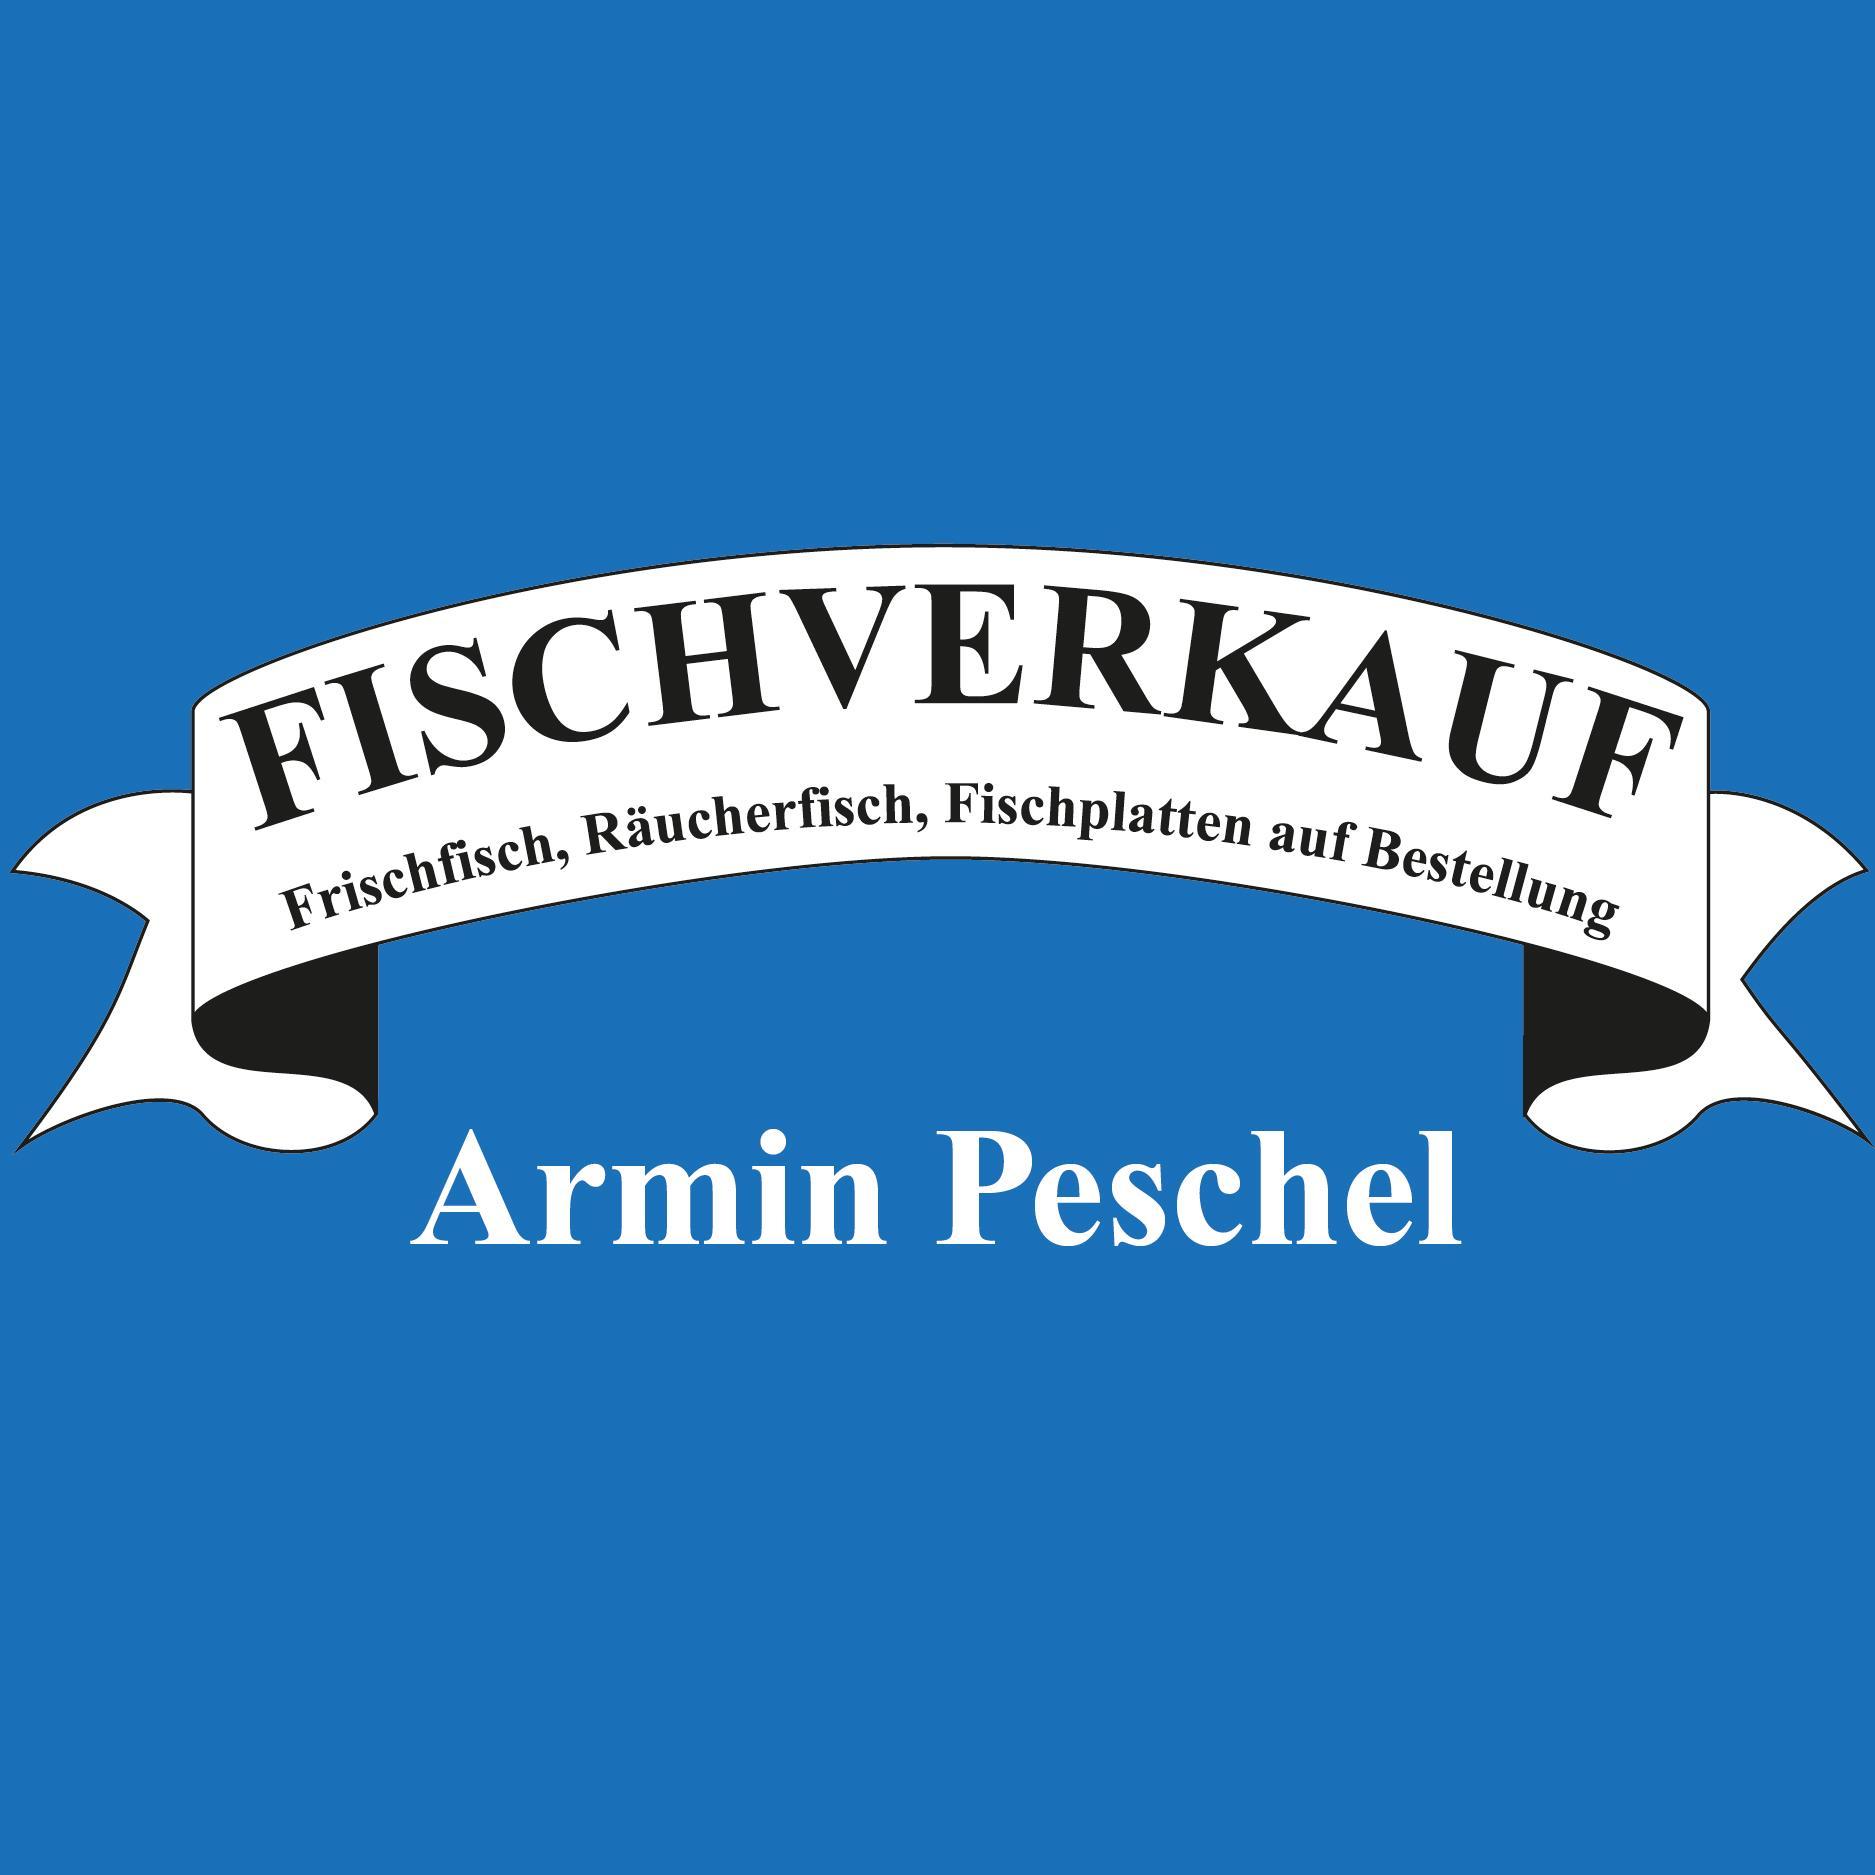 Fischverkauf Armin Peschel